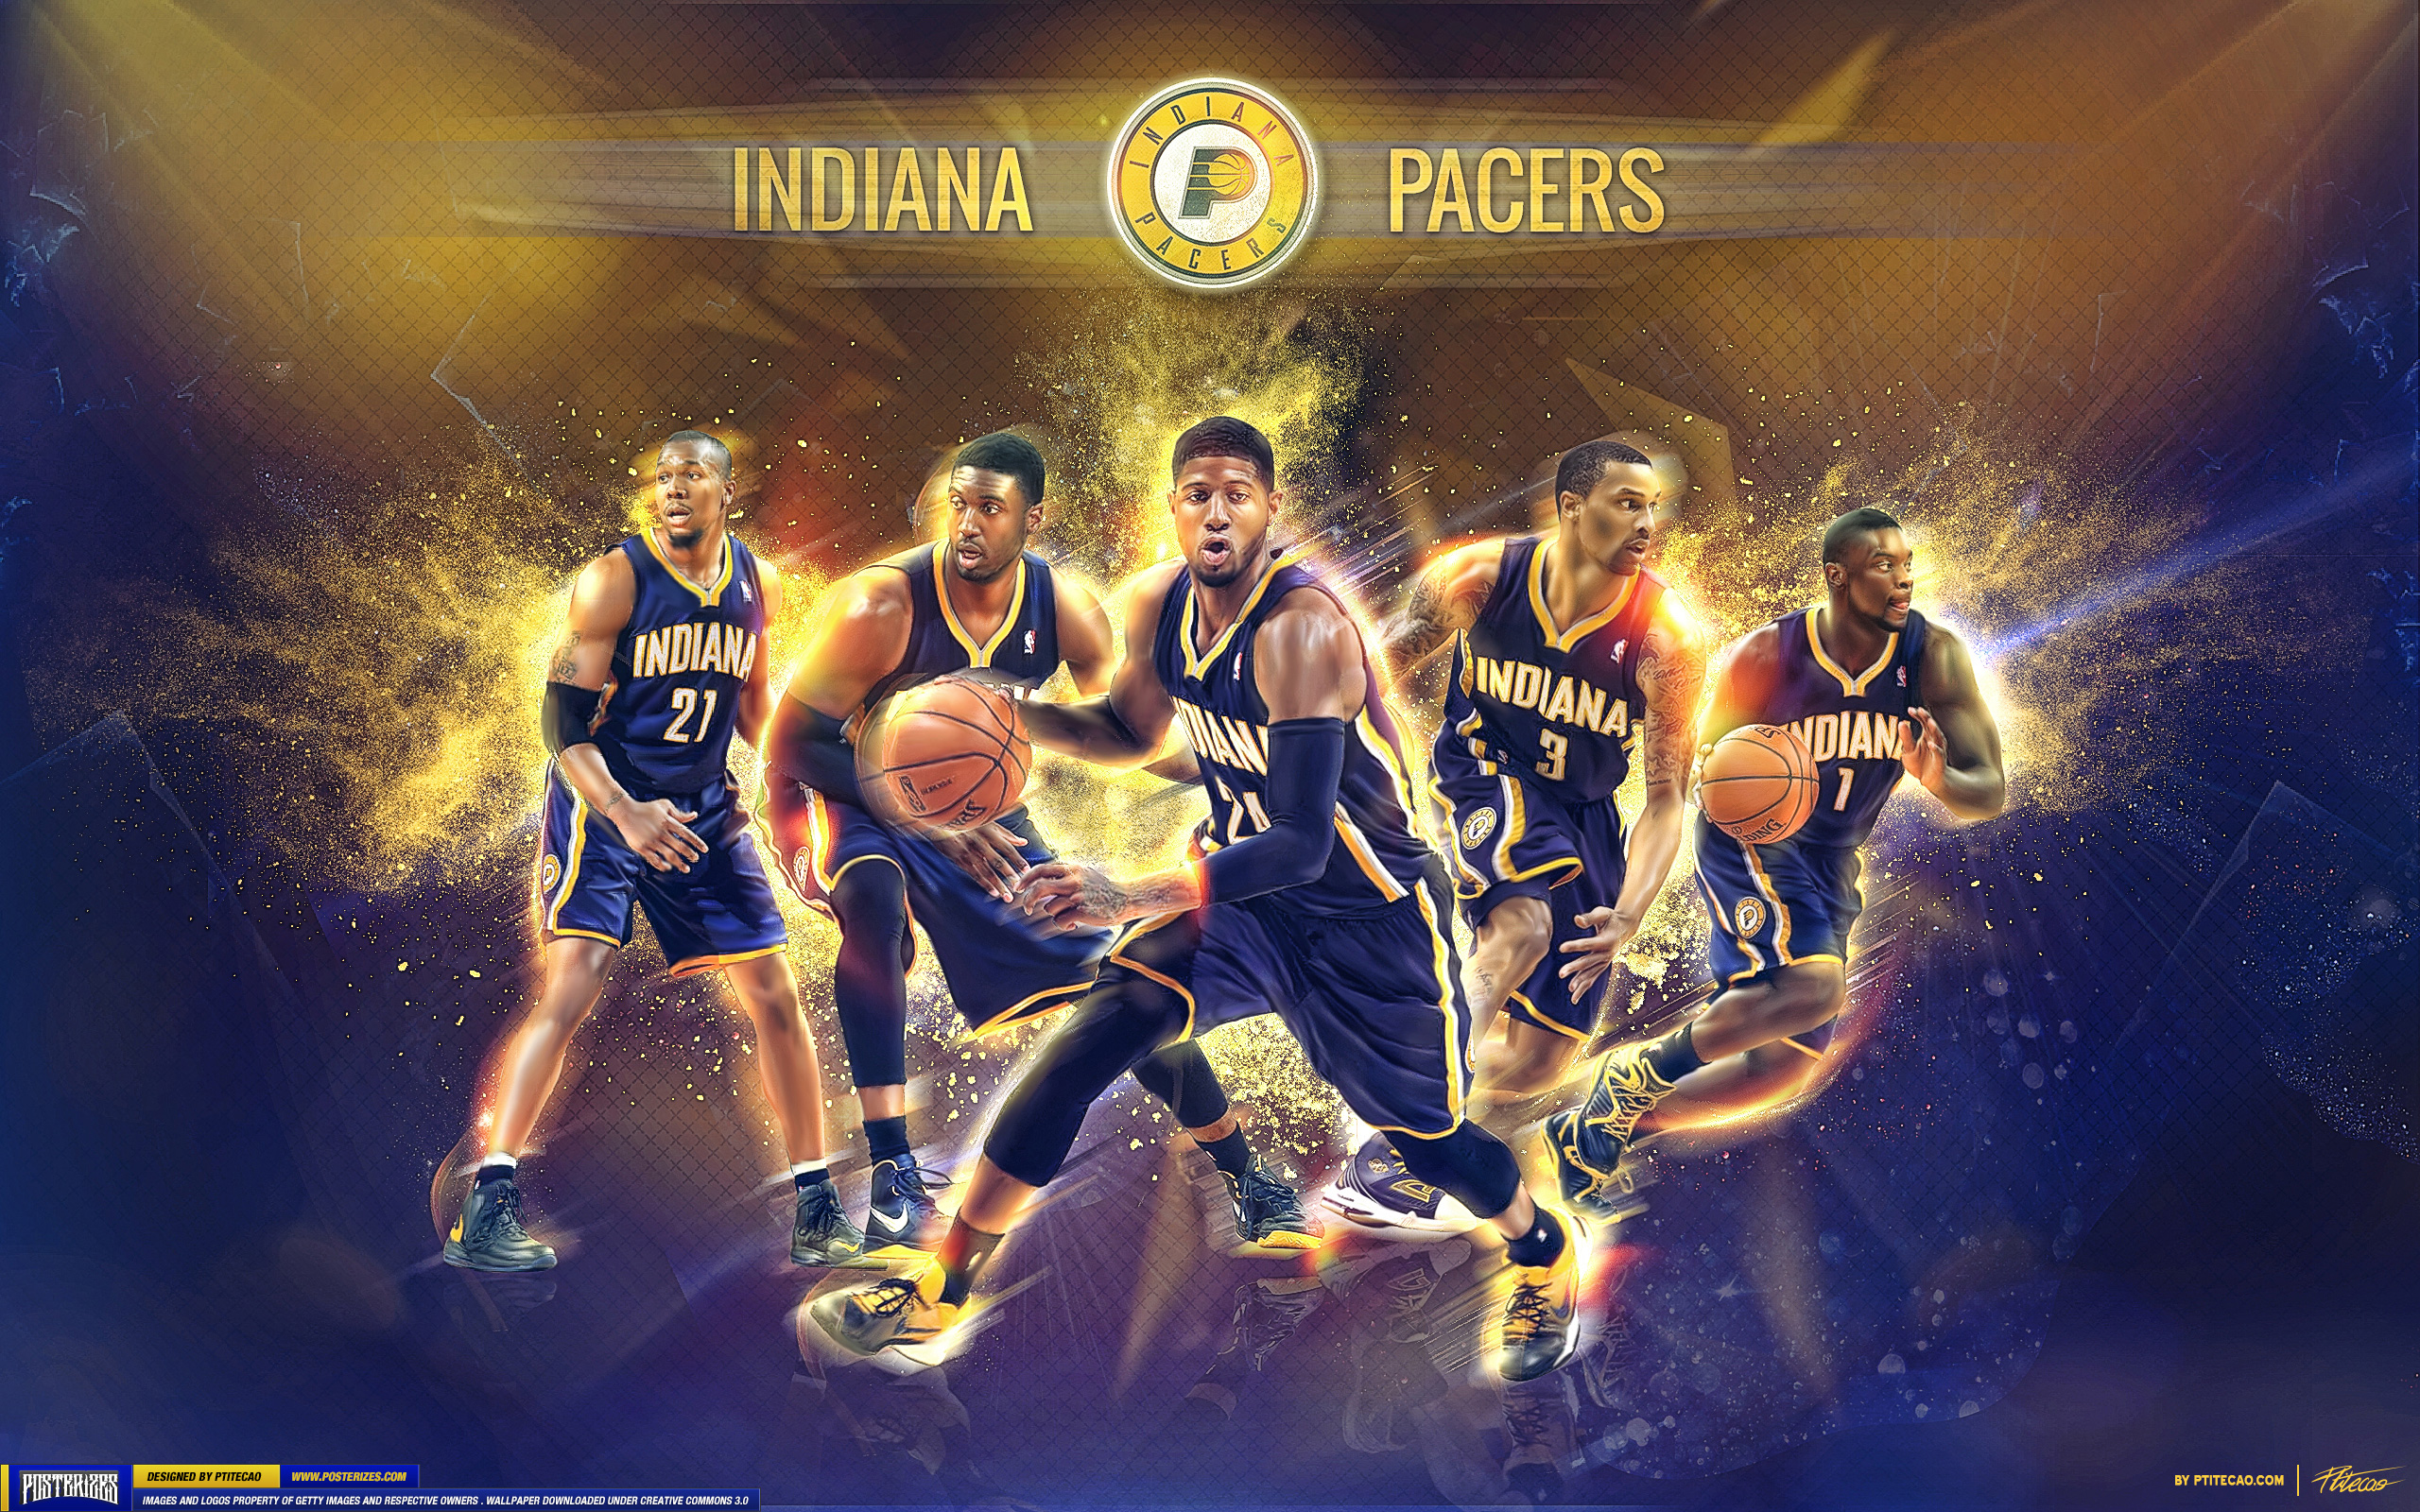 INDIANA PACERS nba basketball 9 wallpaper 2560x1600 227035 2560x1600